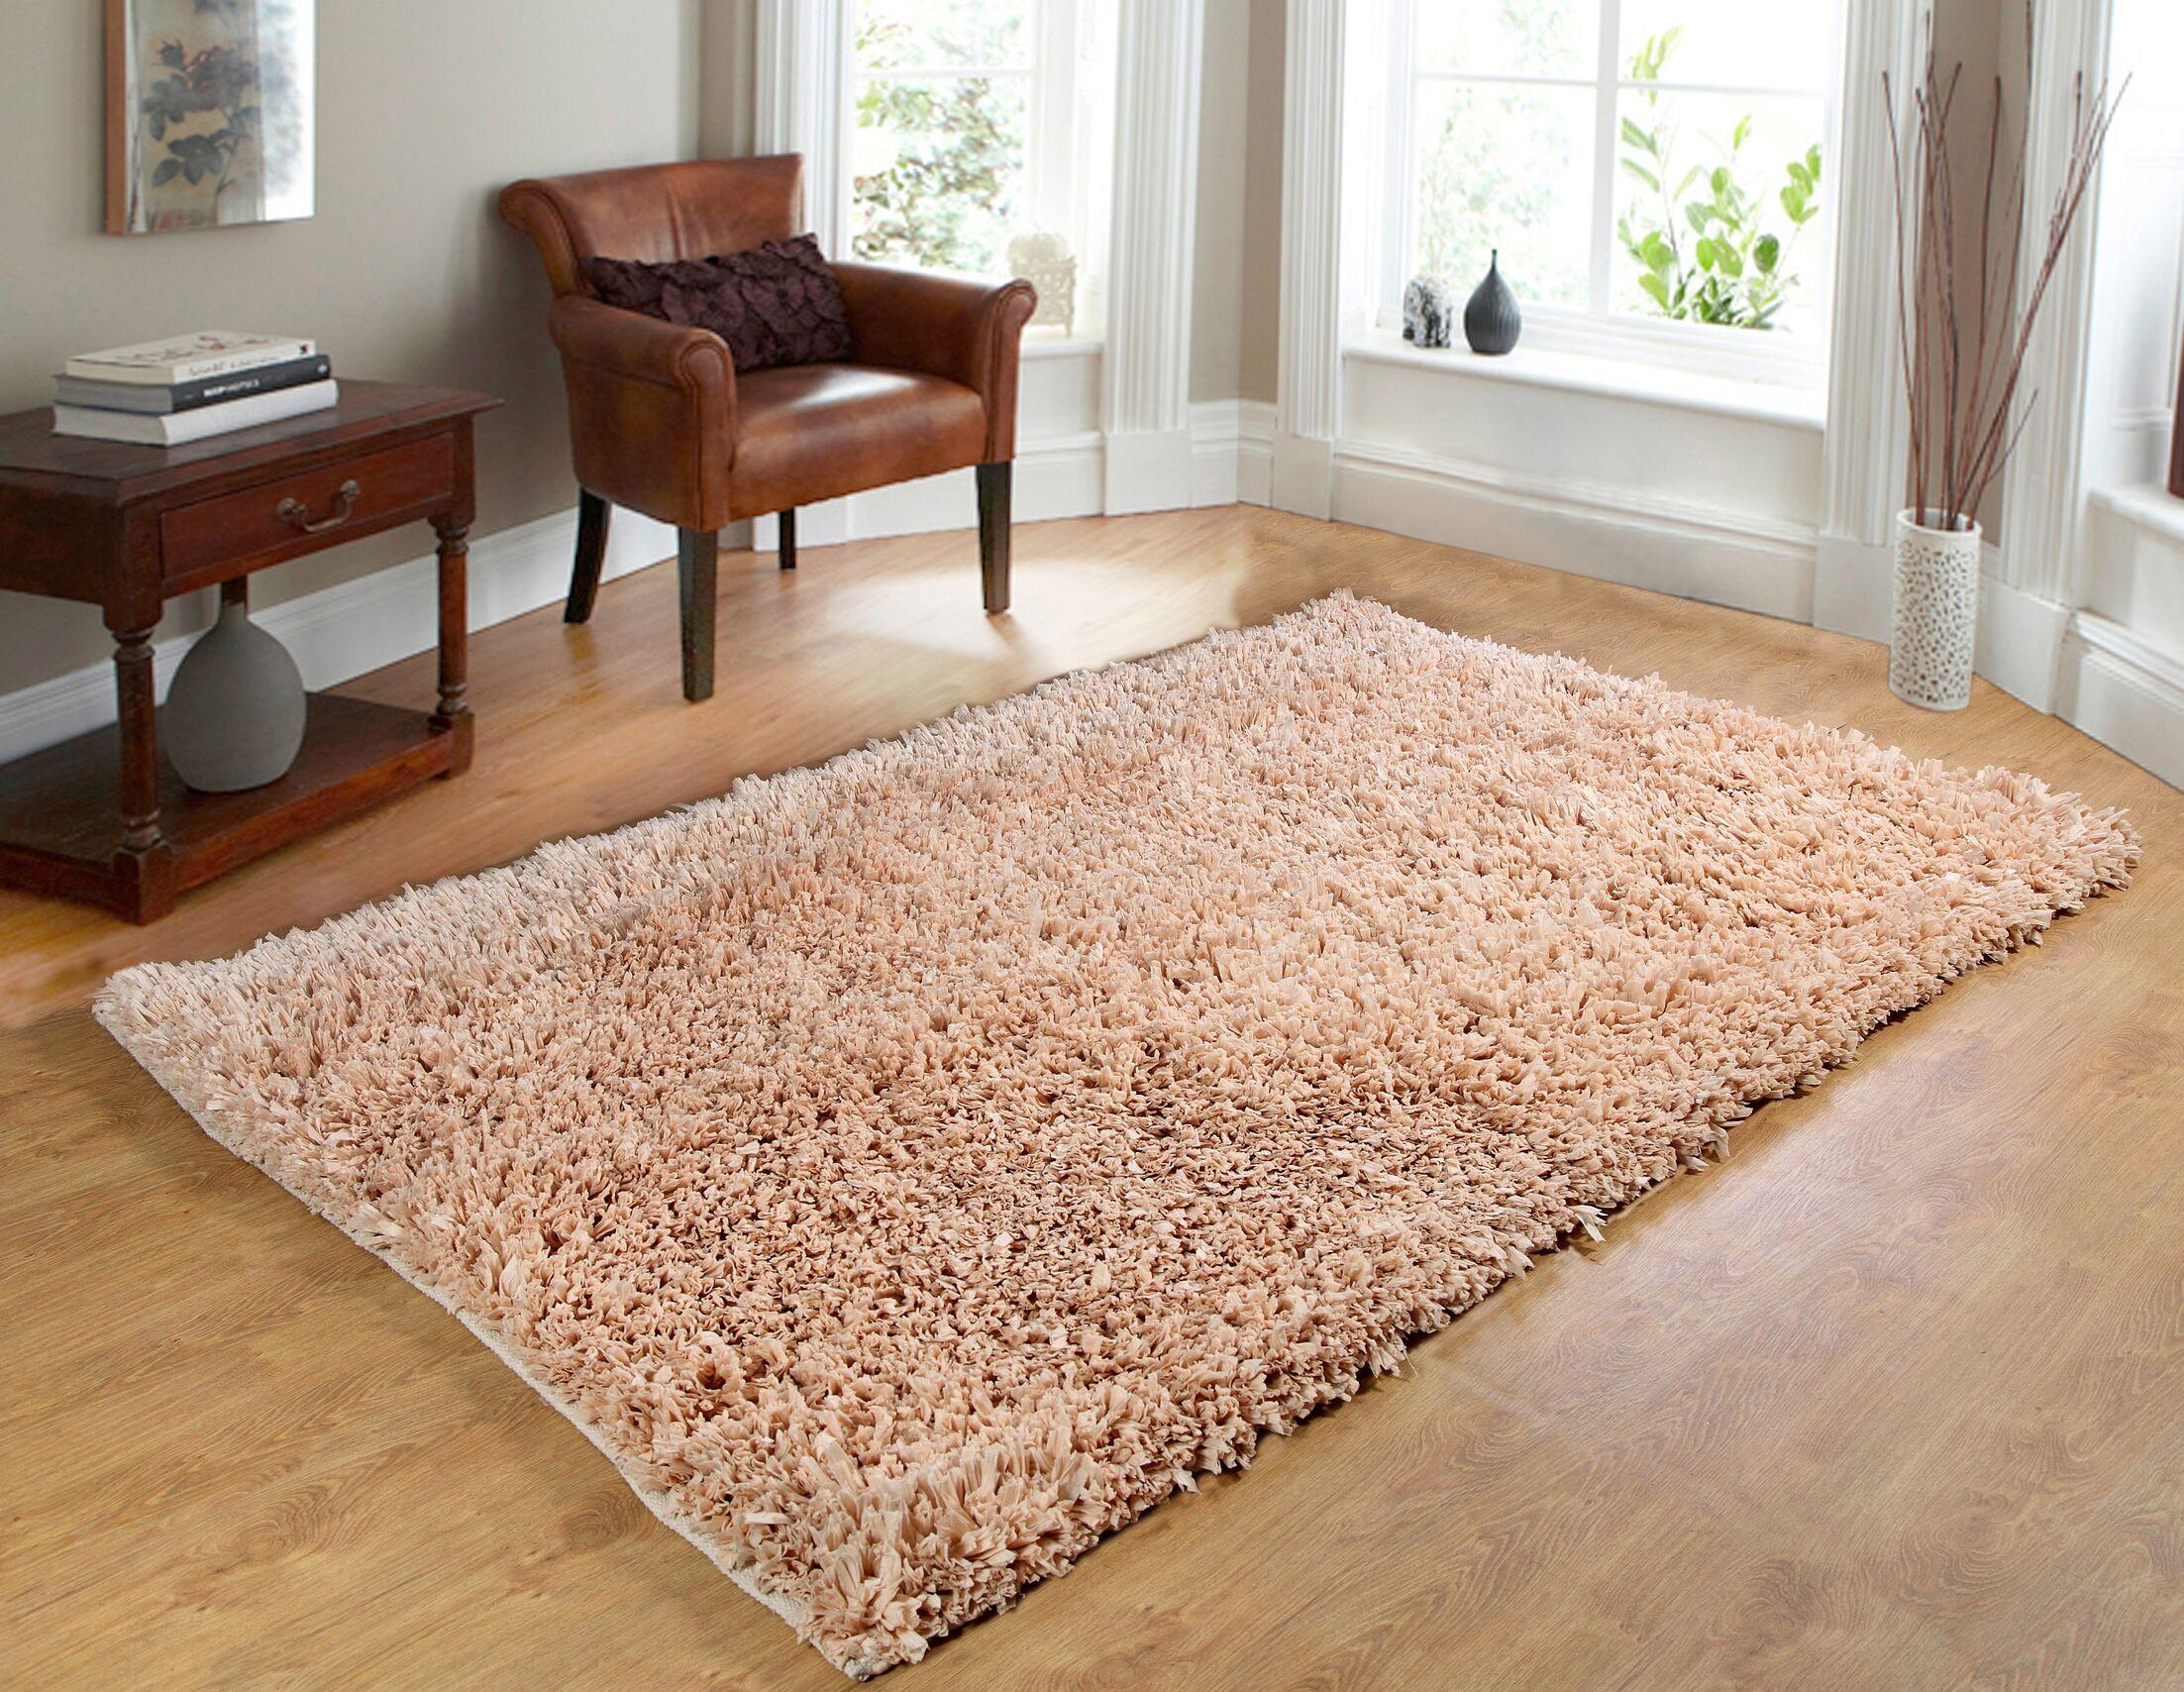 Comfy Hand-Woven Shag Linen Area Rug Rug Size: 5' x 7'